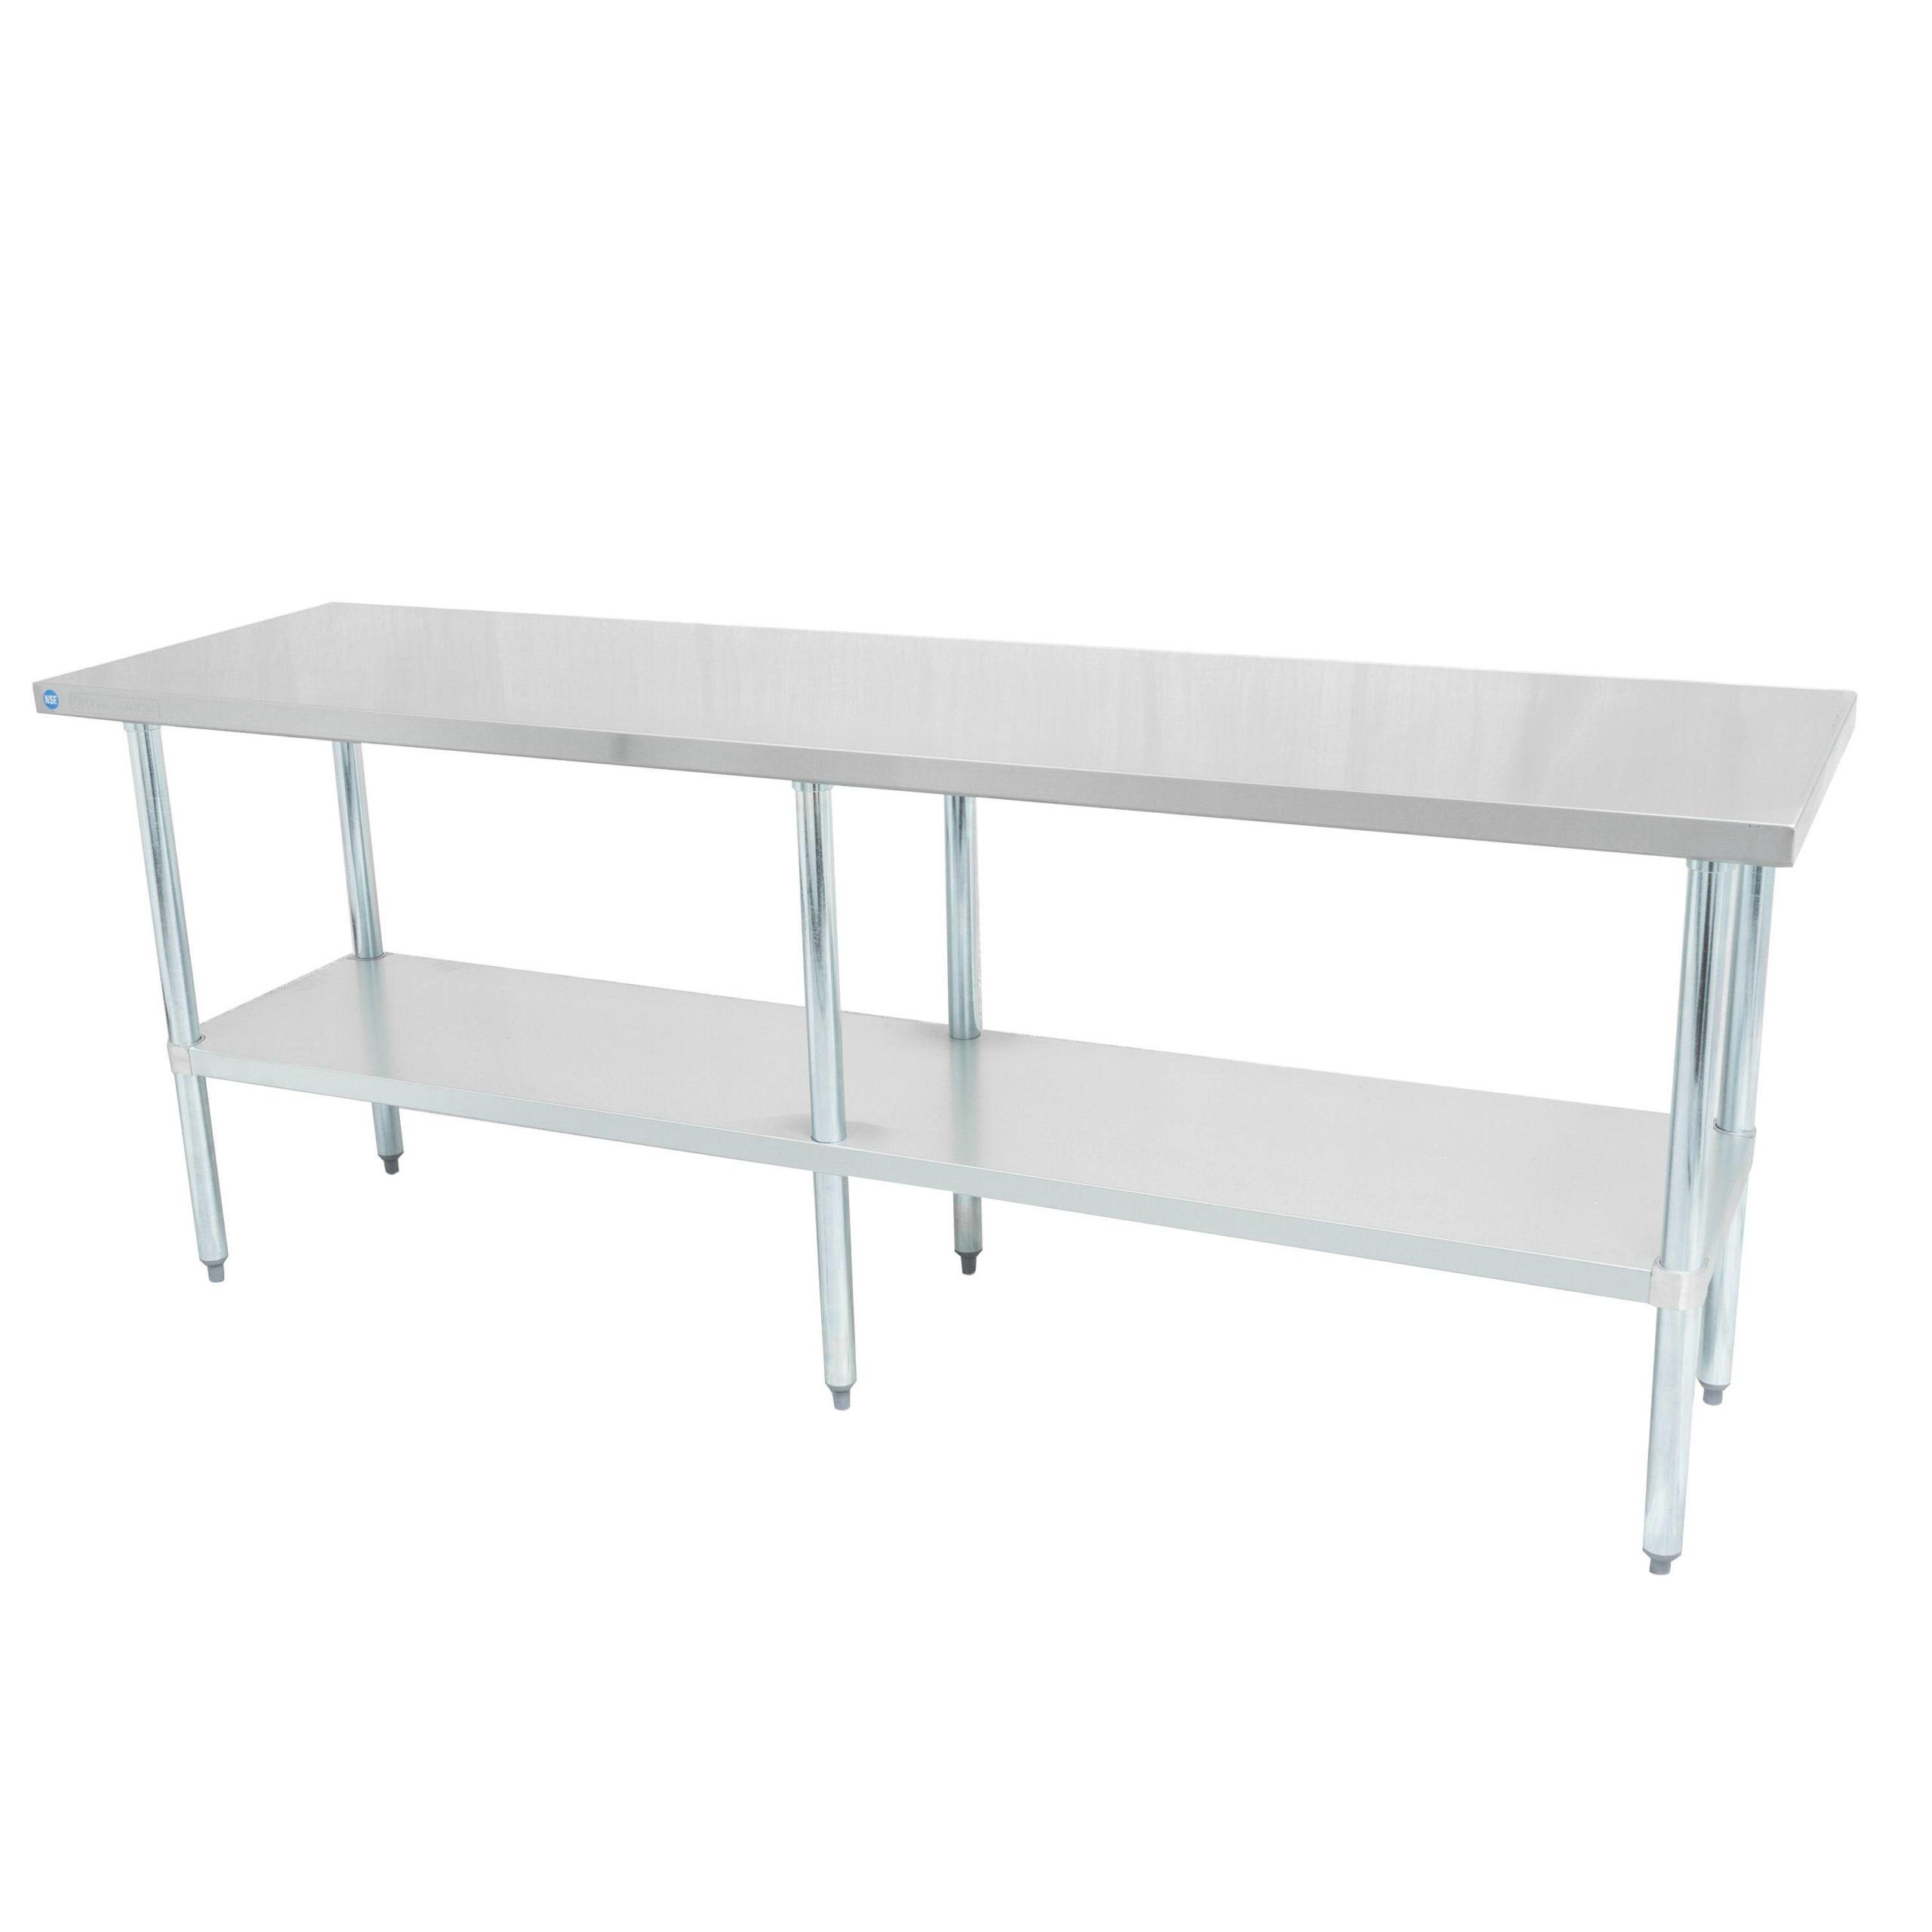 Stainless / Galvanized Worktable